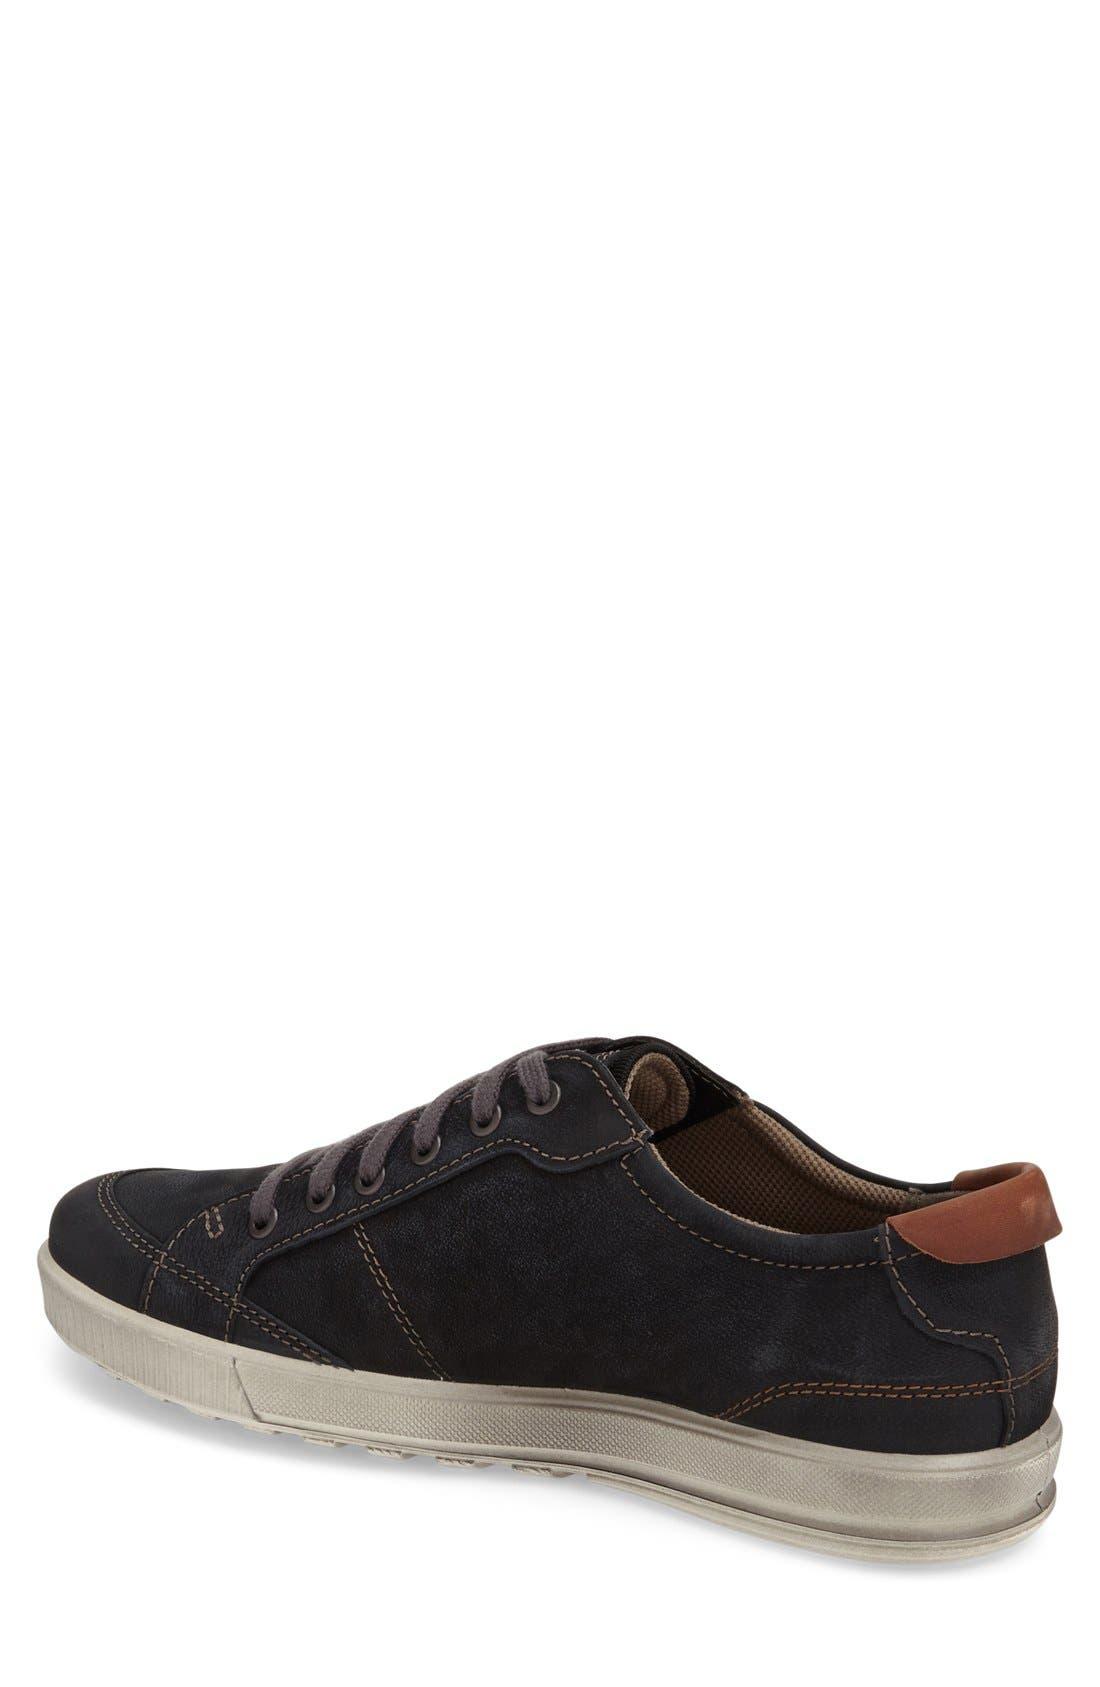 Alternate Image 2  - ECCO 'Ennio Retro' Sneaker (Men)